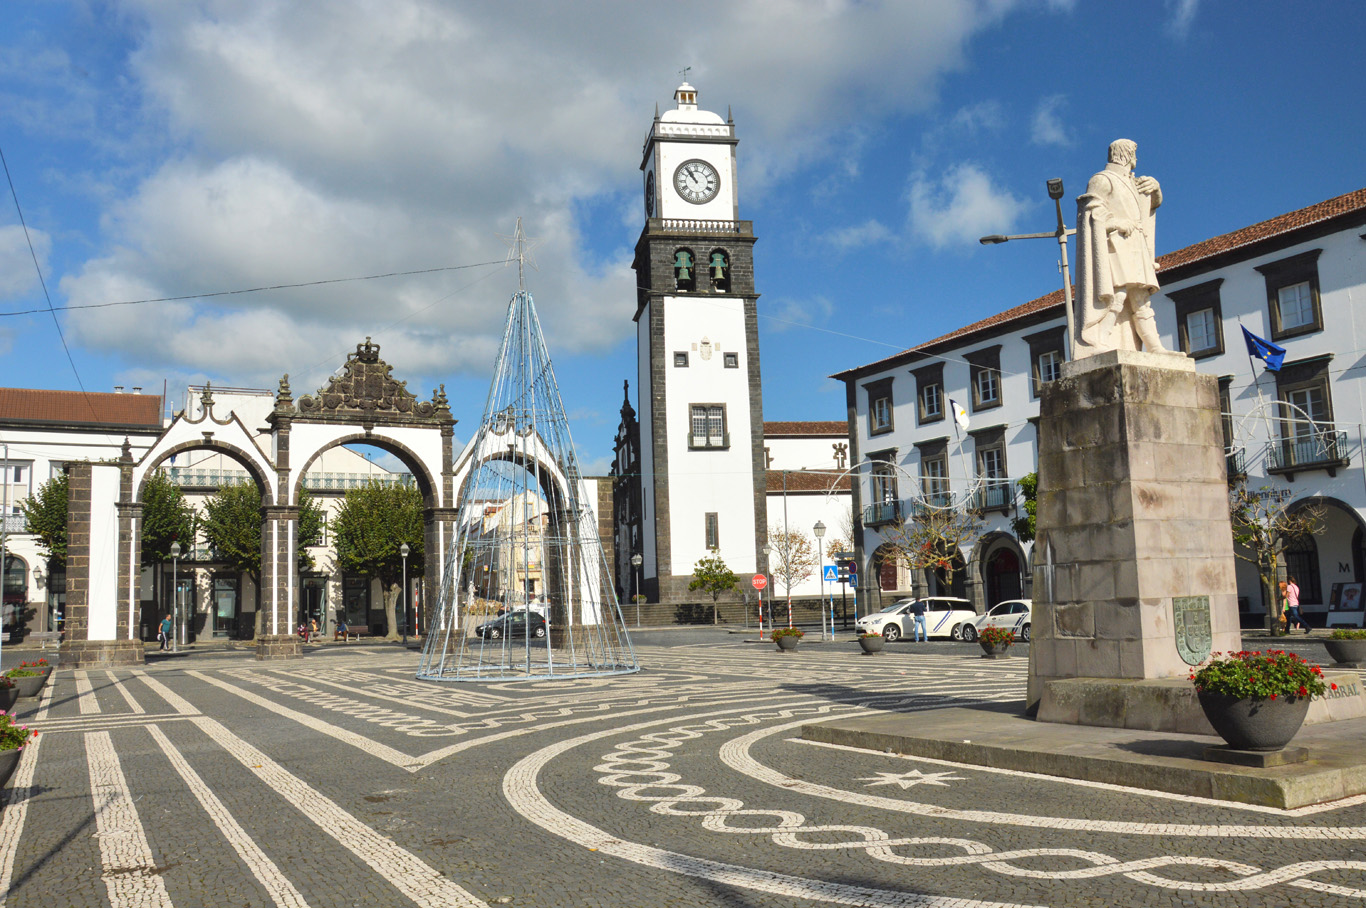 Praça de Gonçalo Velho - the City Gate and the Church of St. Sebastian